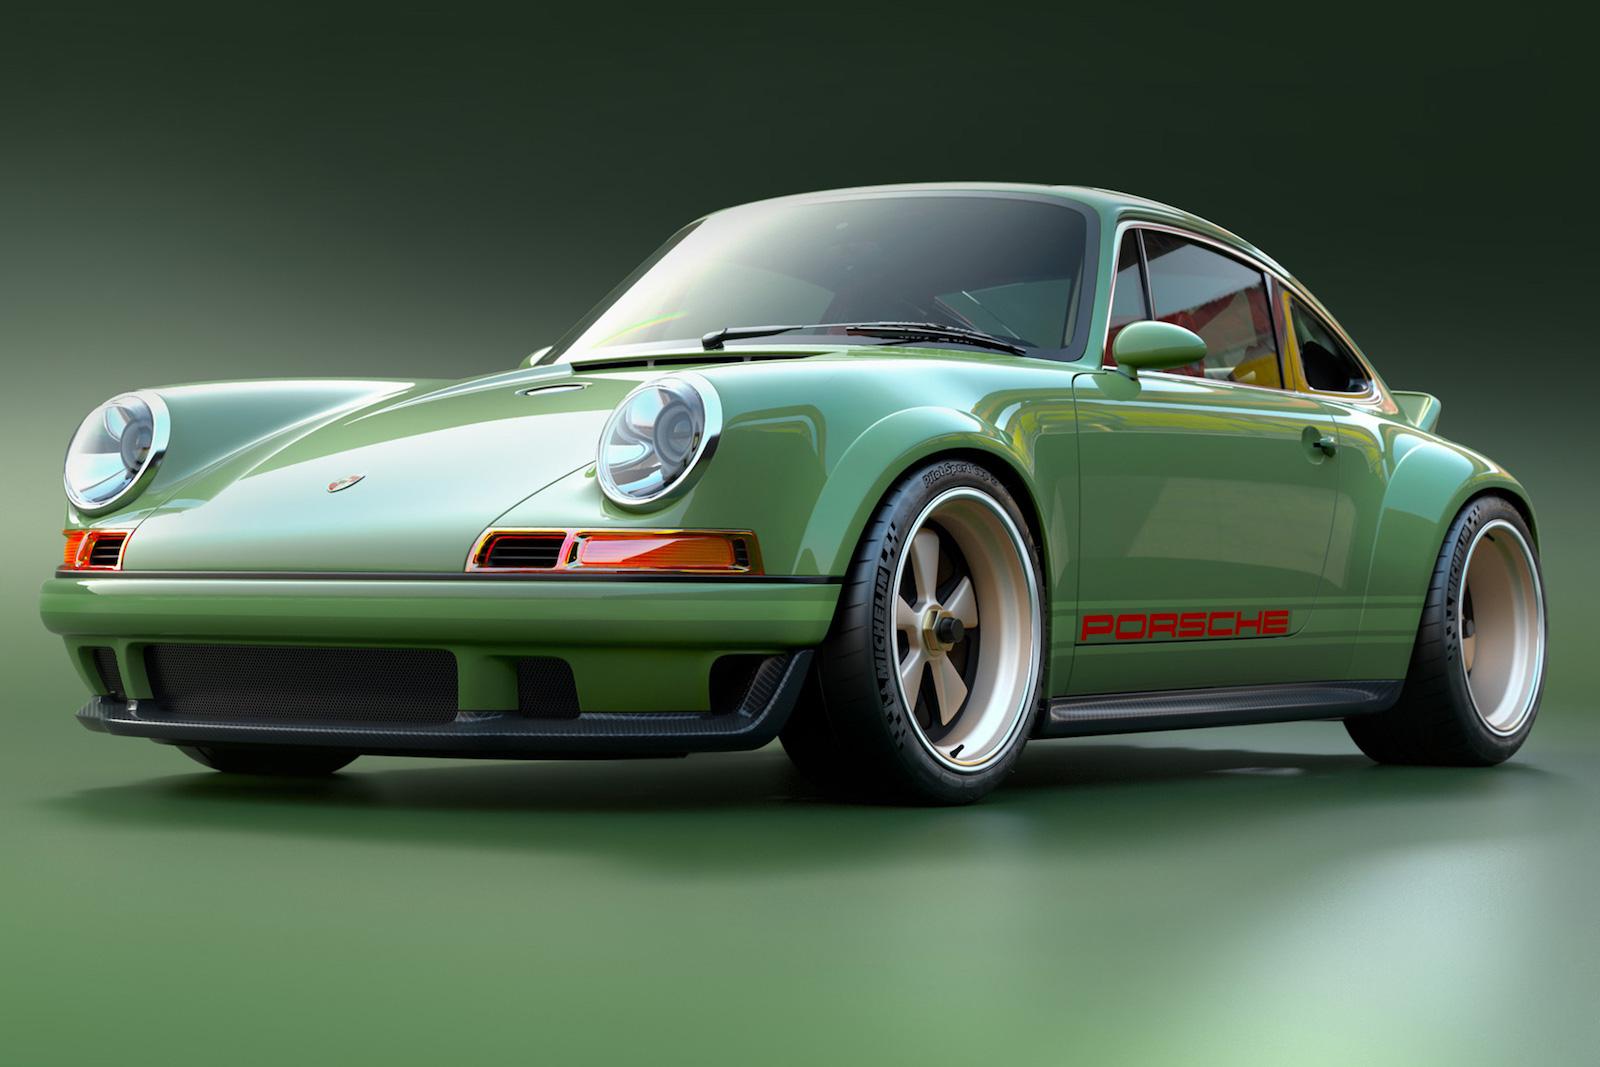 Porsche Project Cars: Restoration, Tuning, Rebuilding, Rust Repair